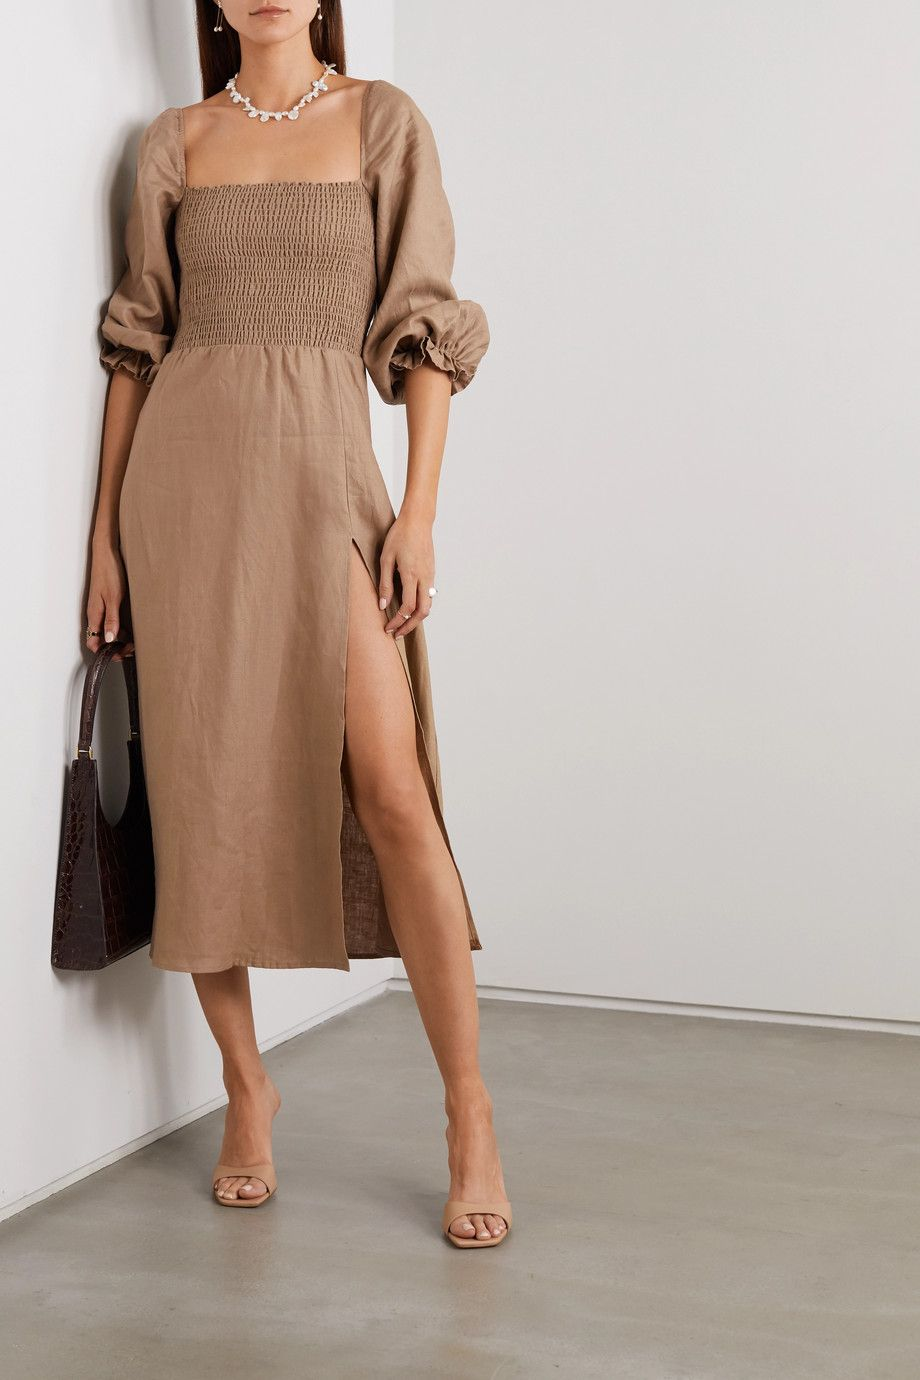 Dark Green Net Sustain Gitane Smocked Linen Midi Dress Reformation Linen Dress Women Linen Midi Dress Mini Dress Casual [ 1380 x 920 Pixel ]